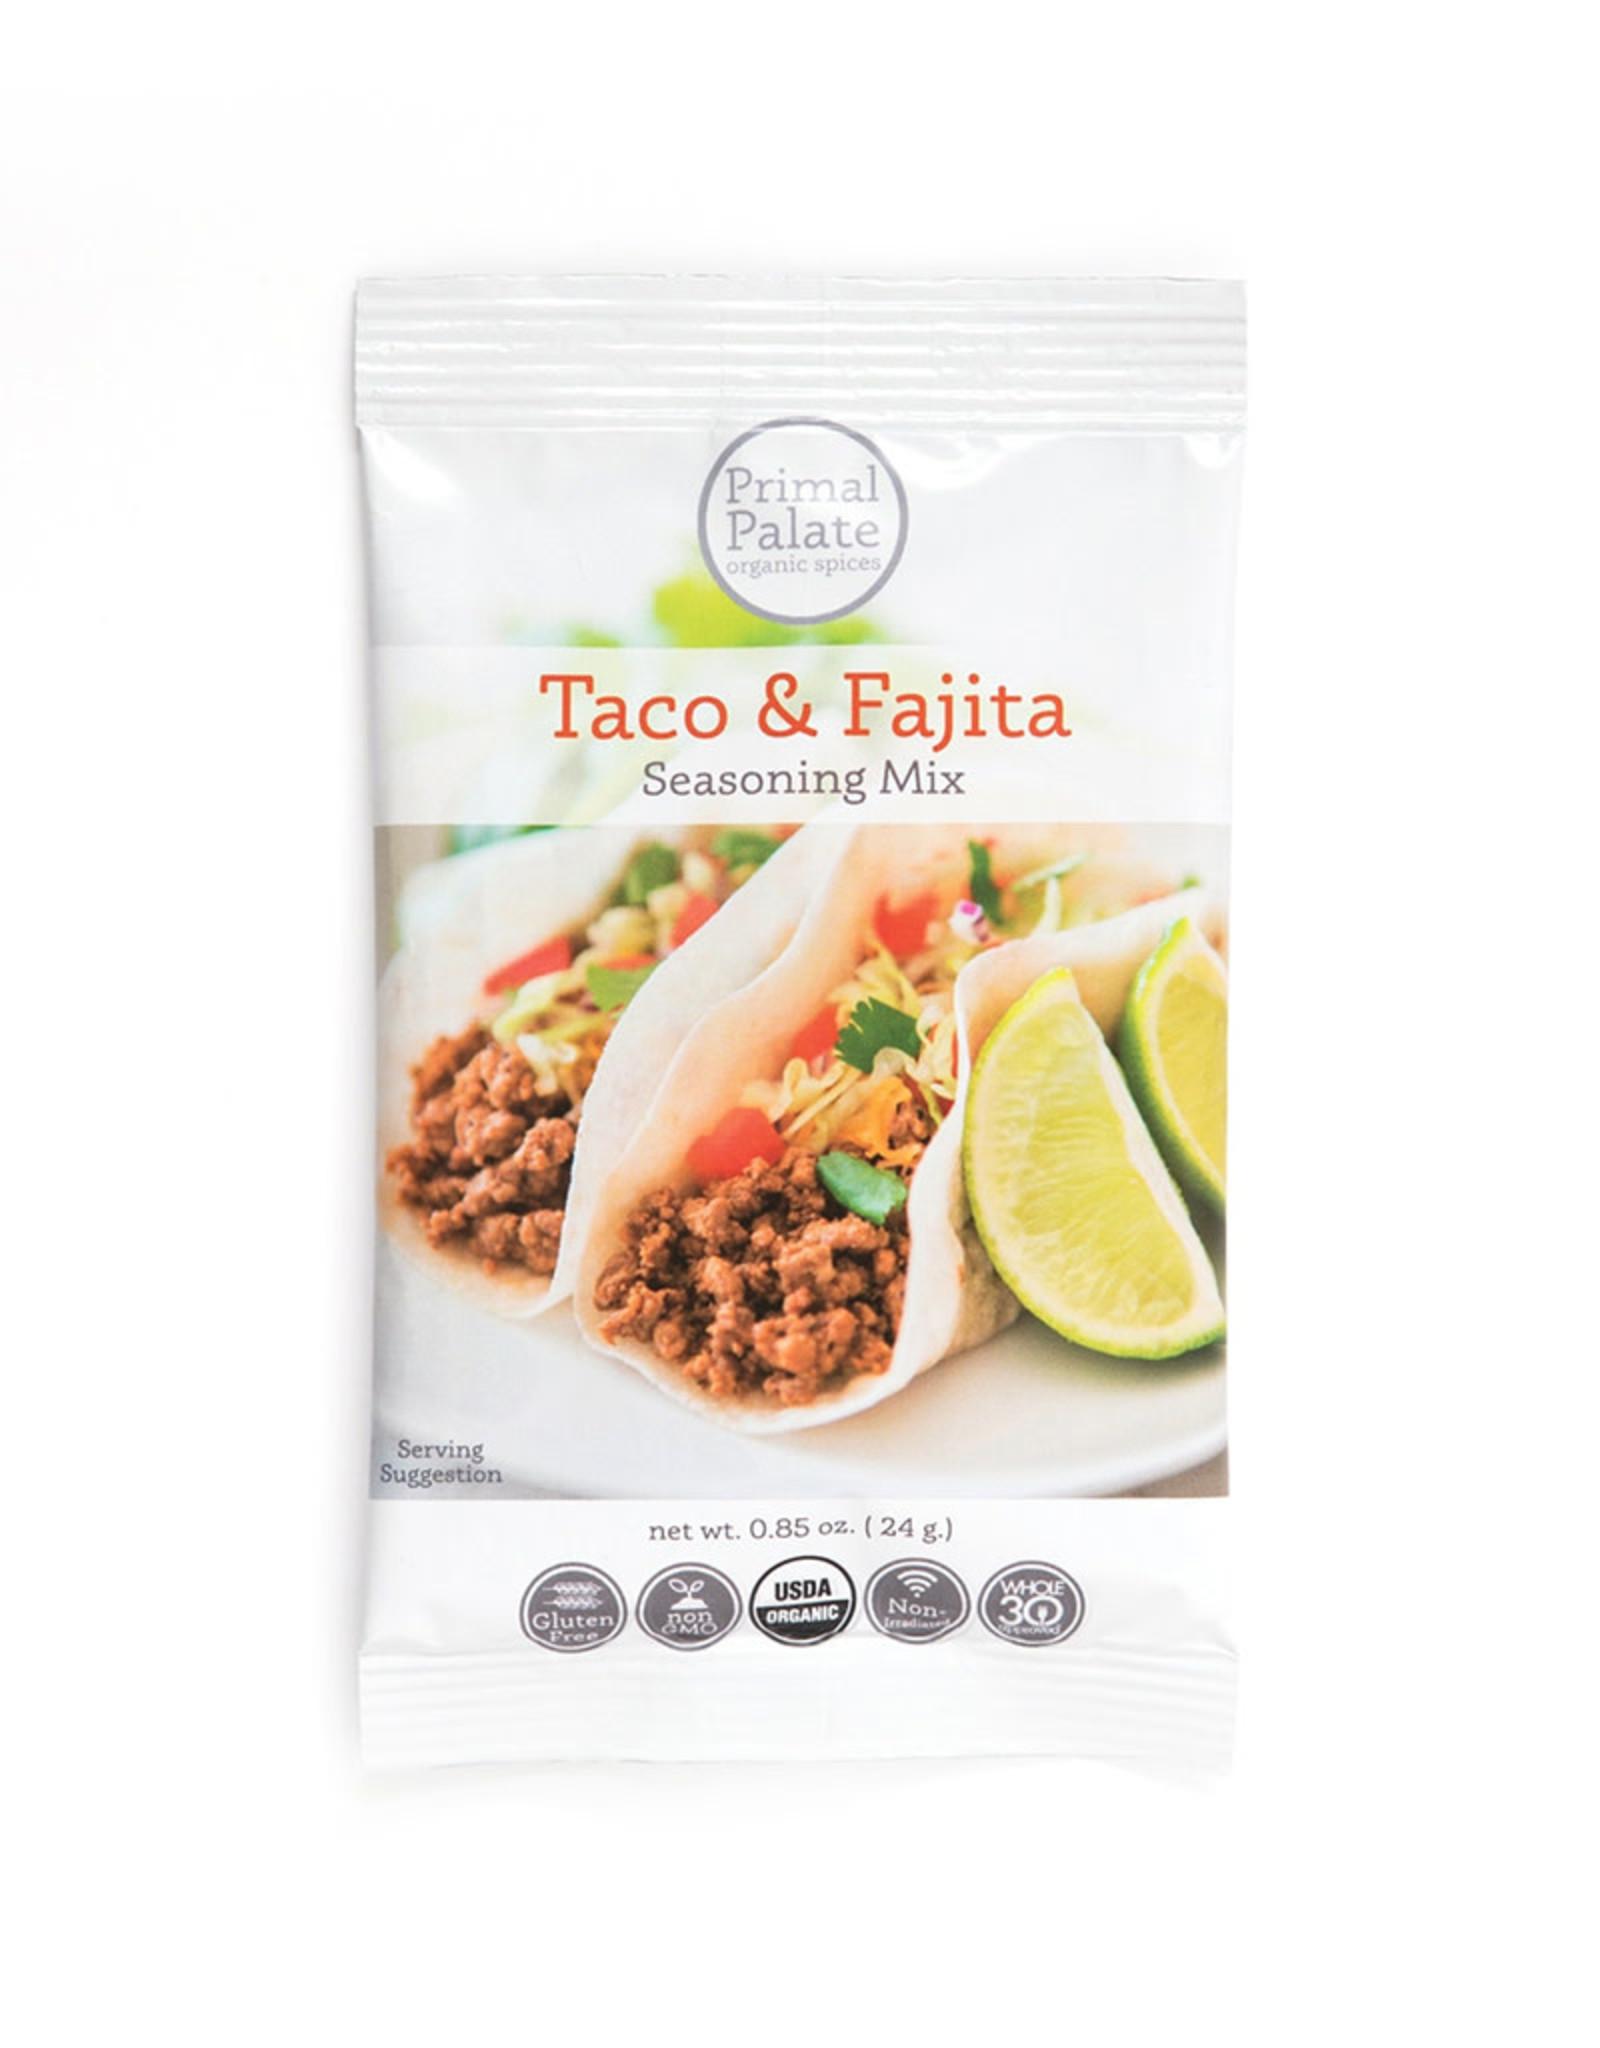 Primal Palate Primal Palate - Seasoning Mix, Taco & Fajita (24g)